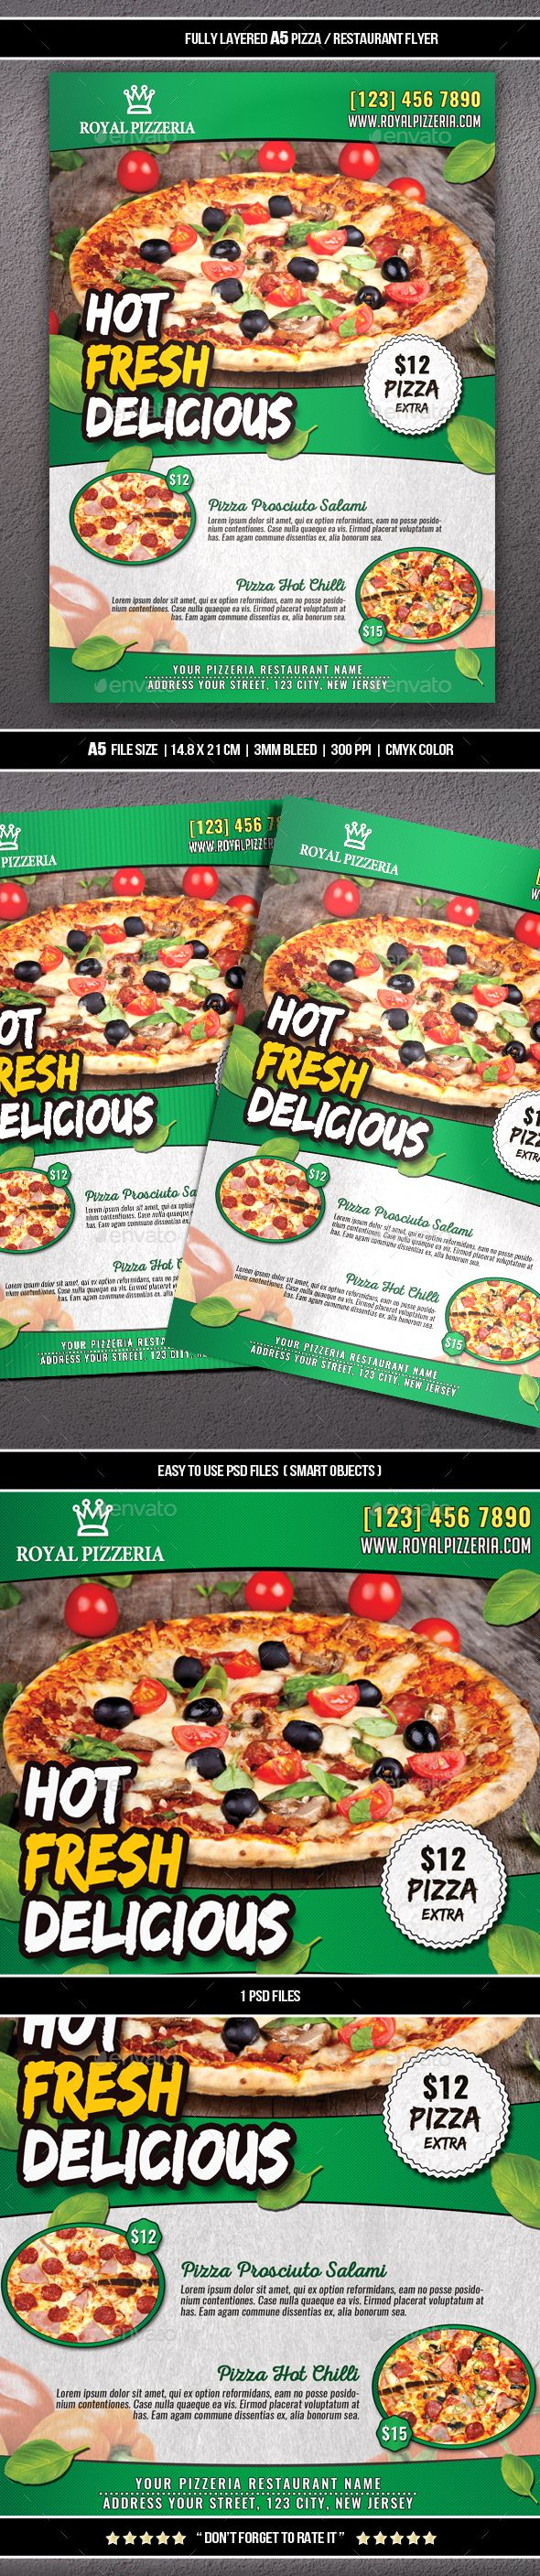 Pizza Restaurant Flyer A5 Restaurant Flyer Flyer Design Template Design